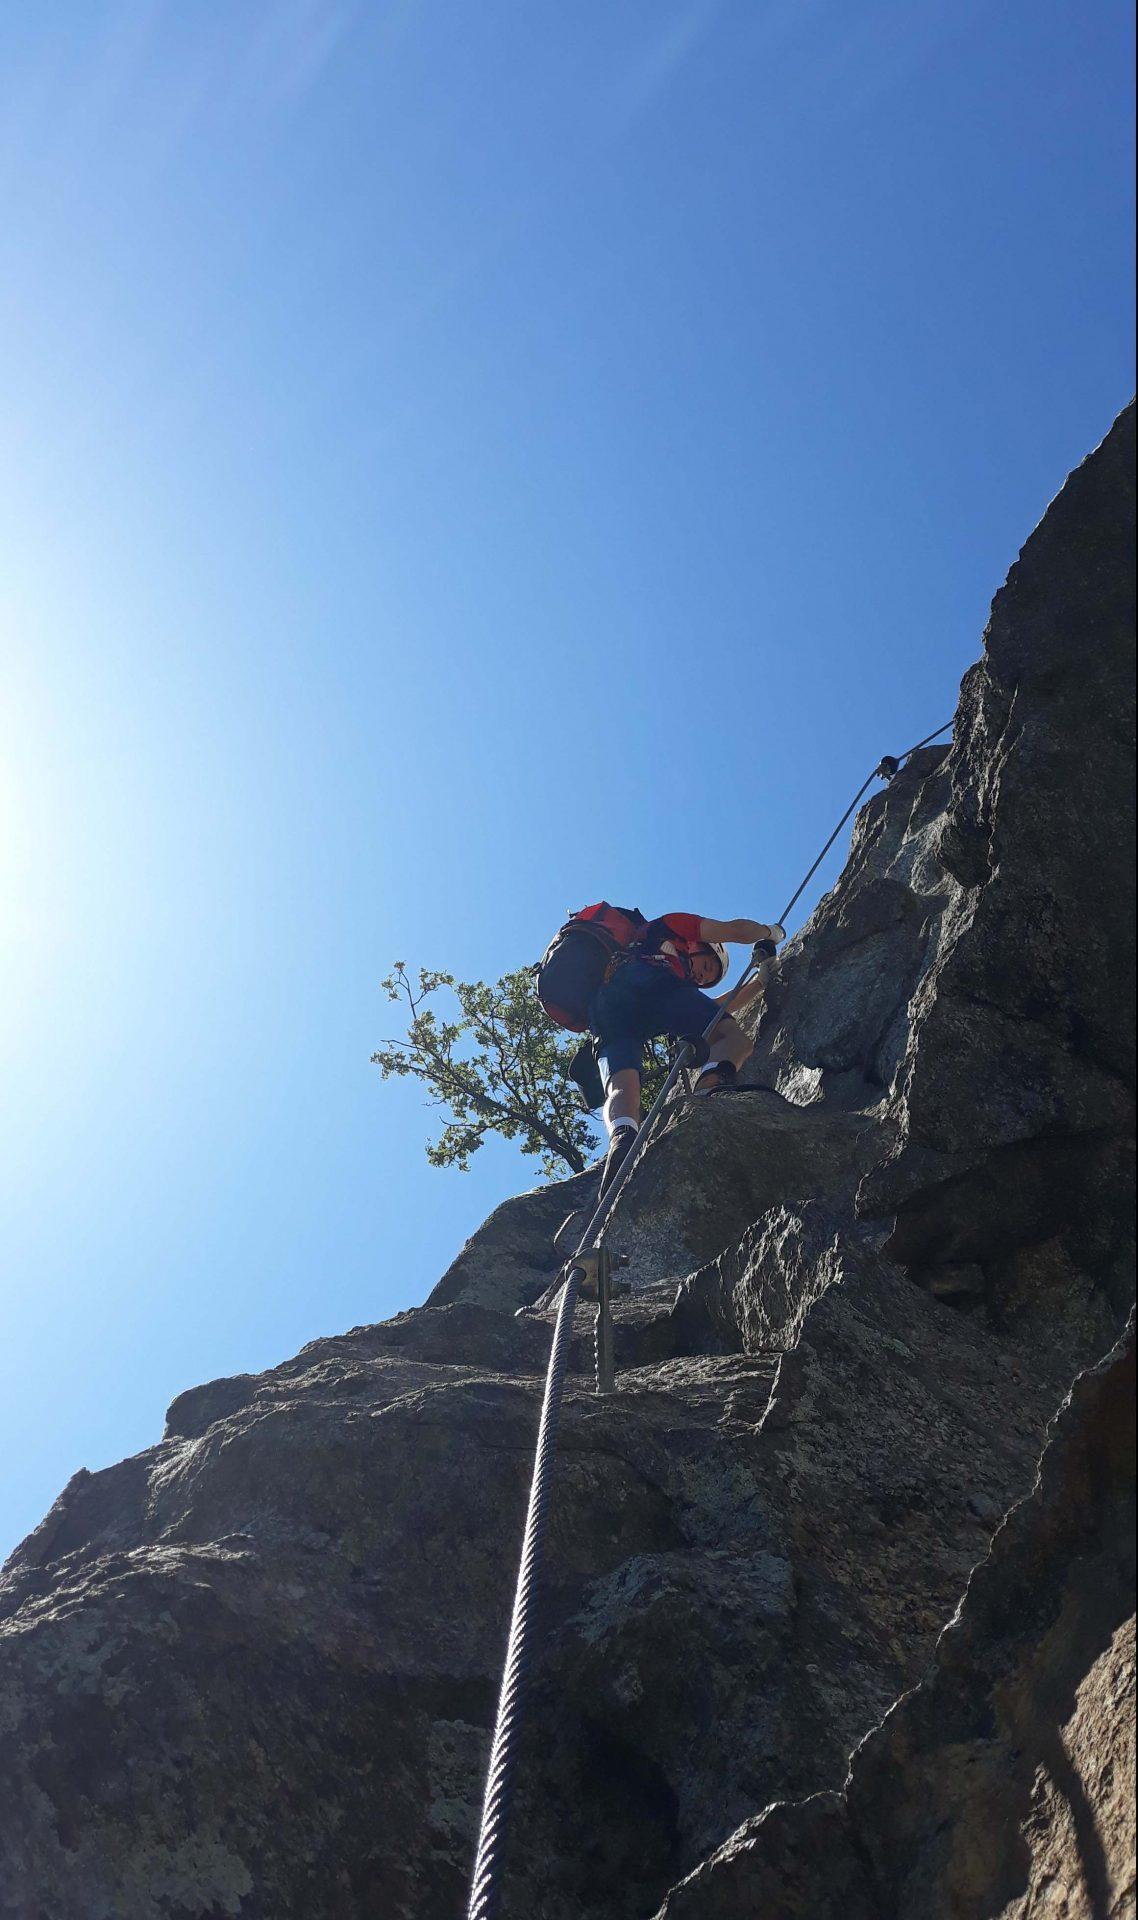 Klettersteig I Bergeerleben (c) BRD Meran